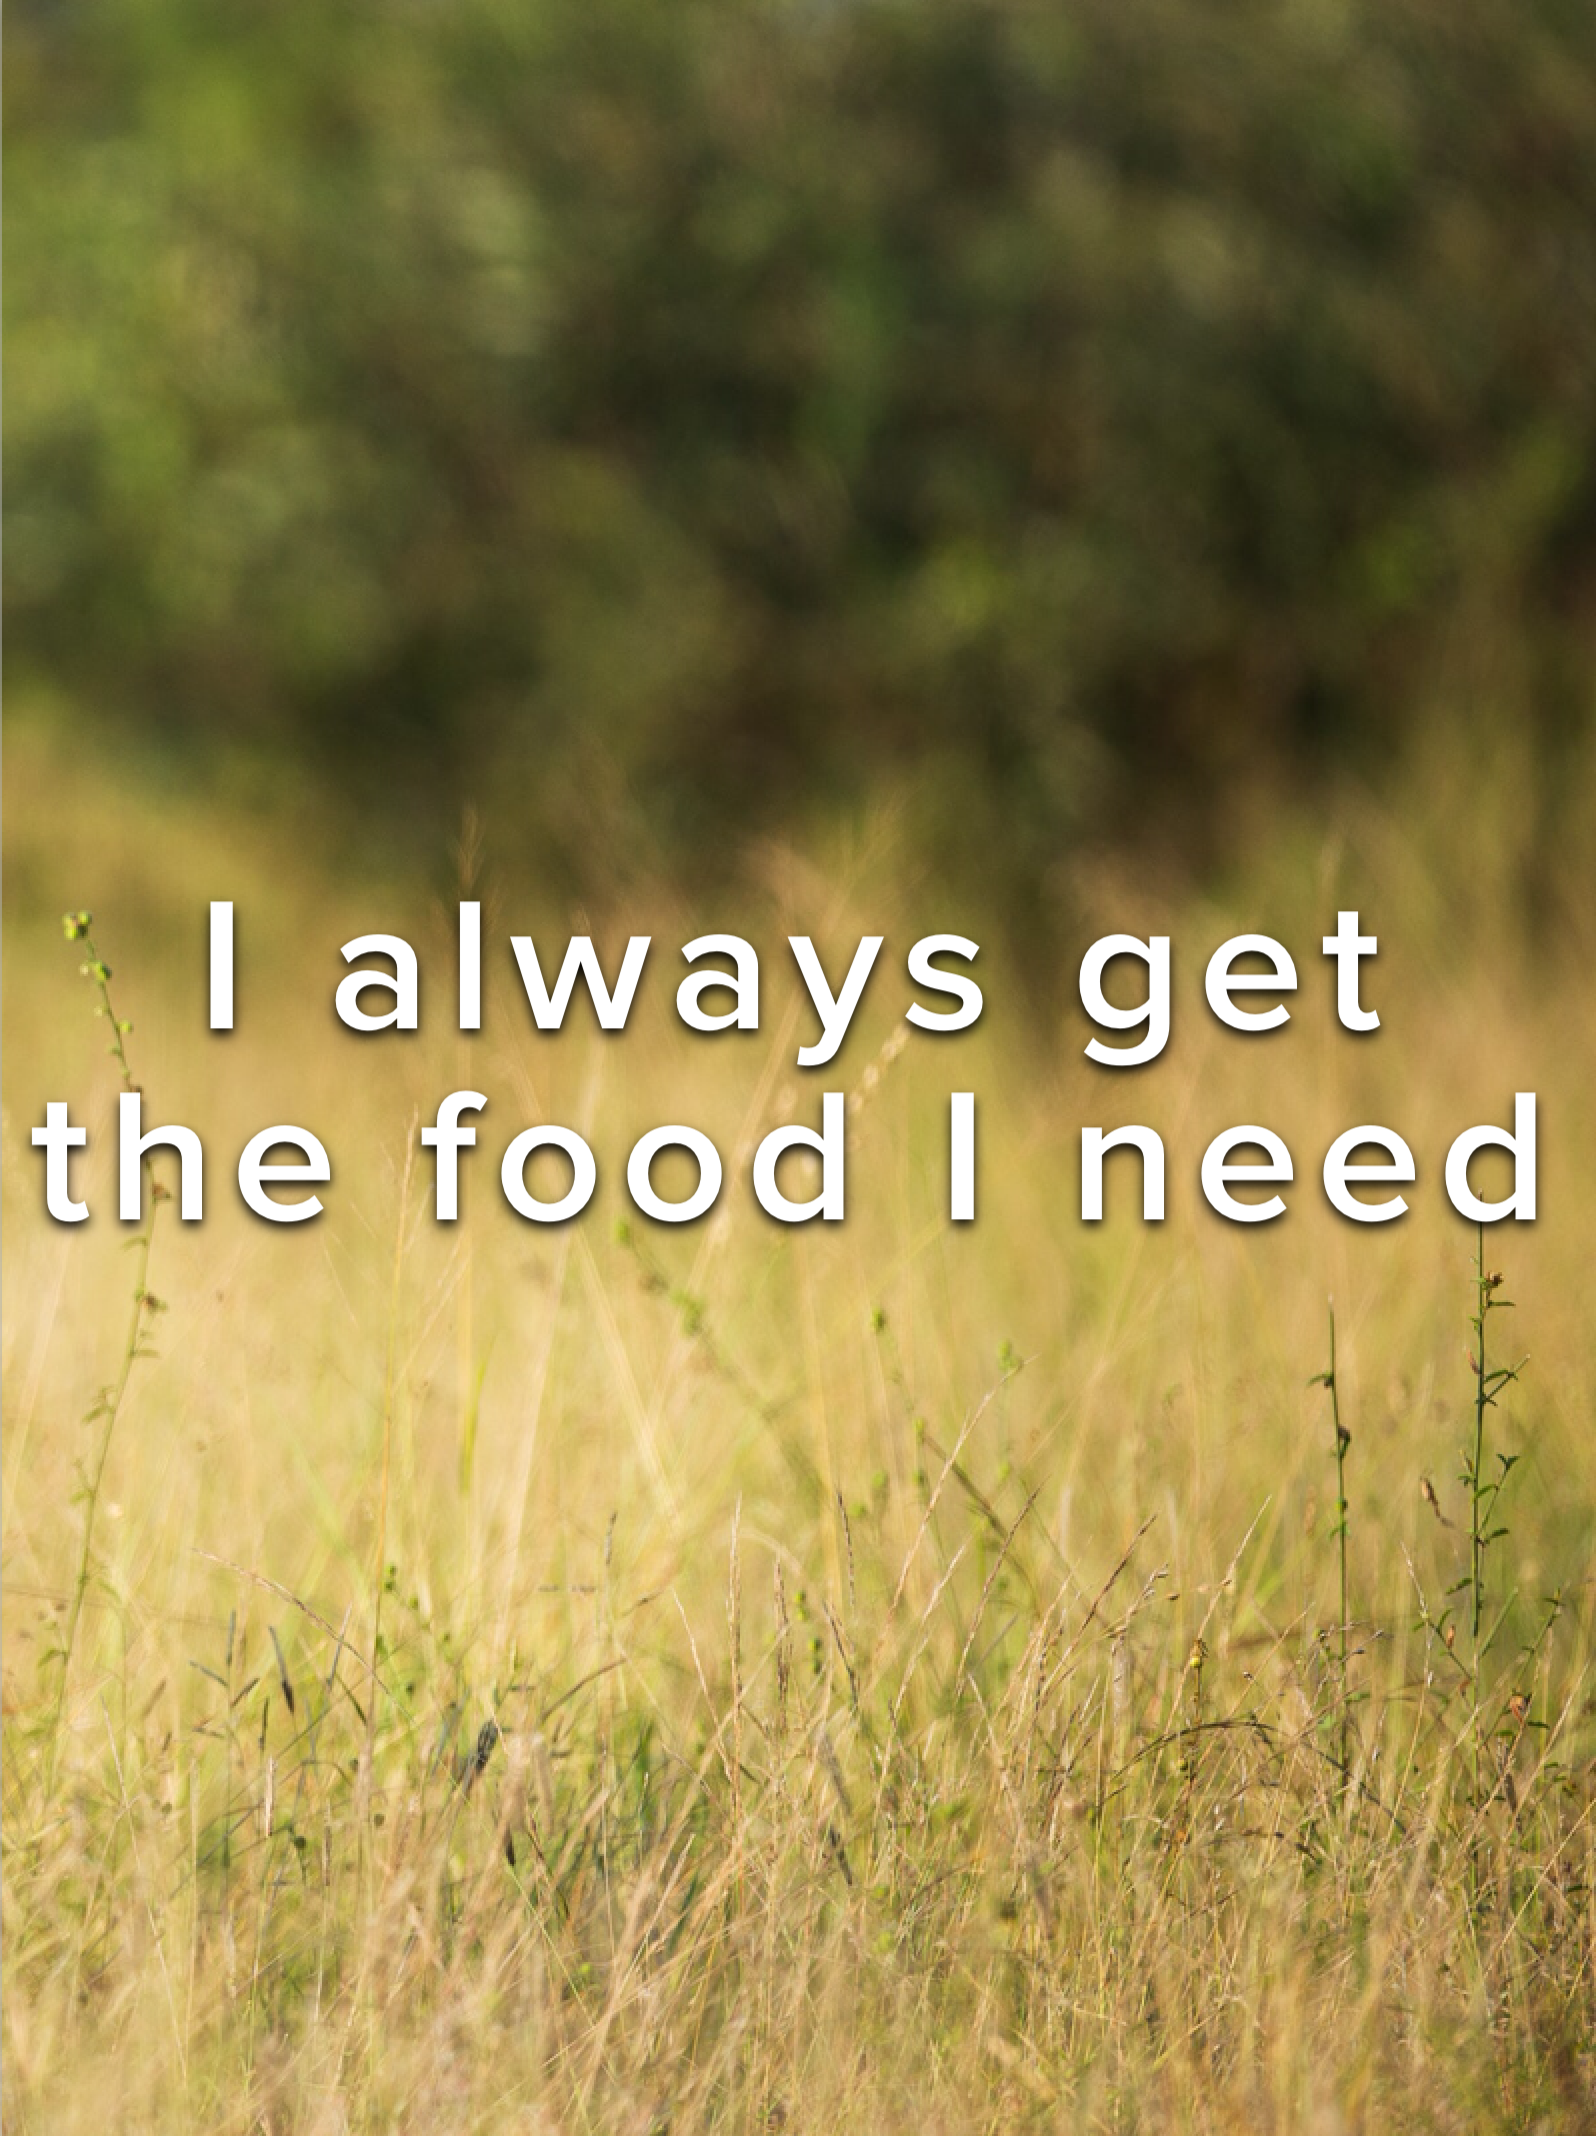 I ALWAYS get the food that I need. . Lr health affirmation